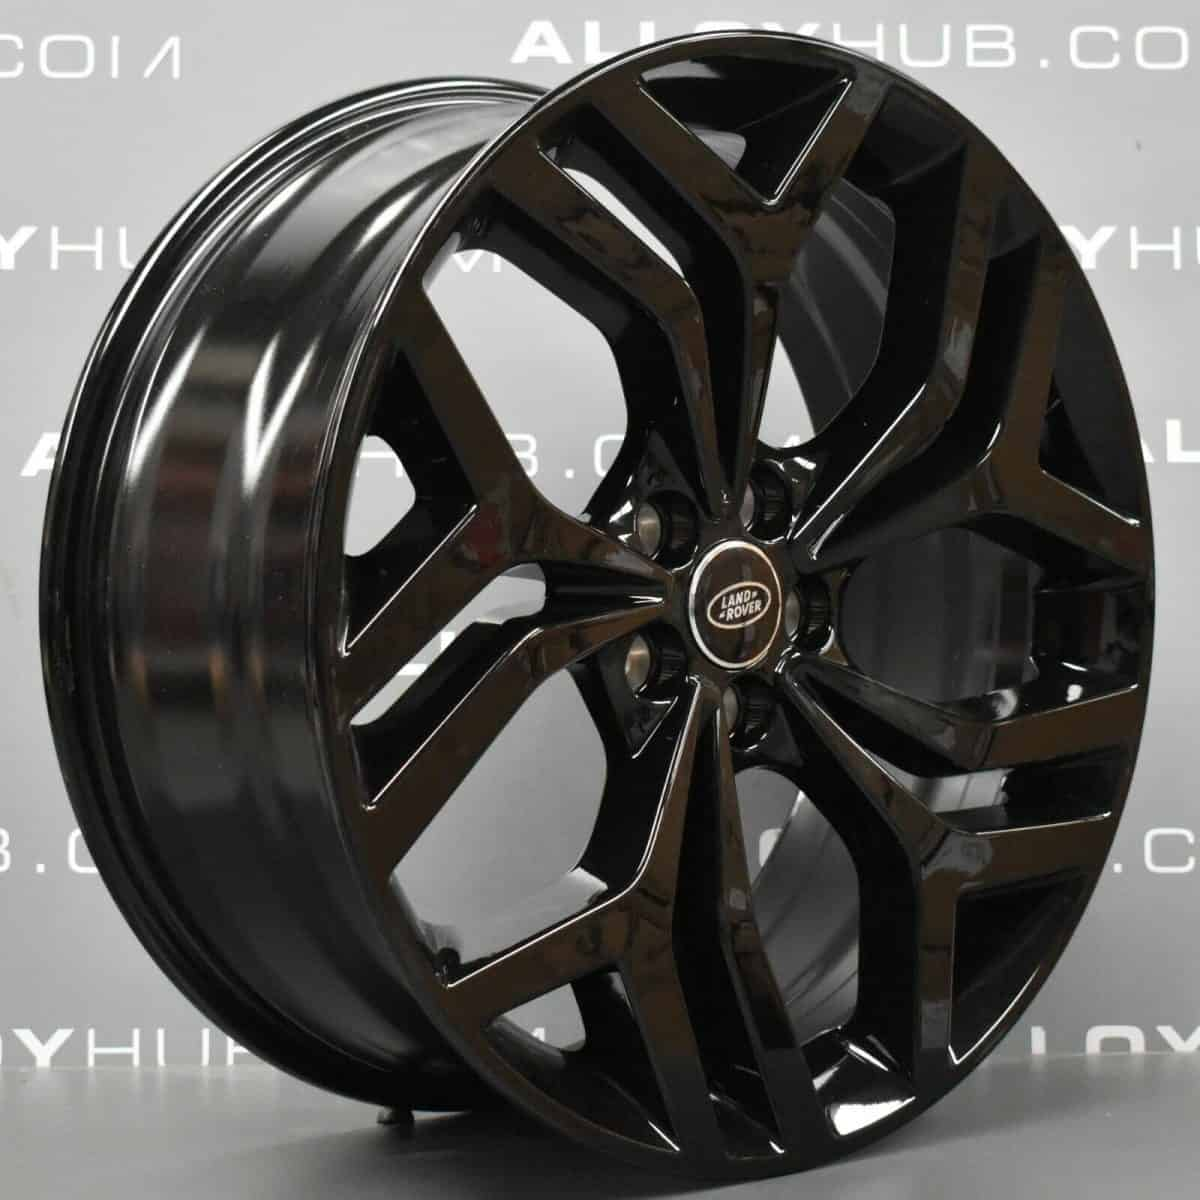 "Genuine Range Rover Evoque 20"" inch Style 5079 5 Split-Spoke Alloy Wheels with Gloss Black Finish LR114528"